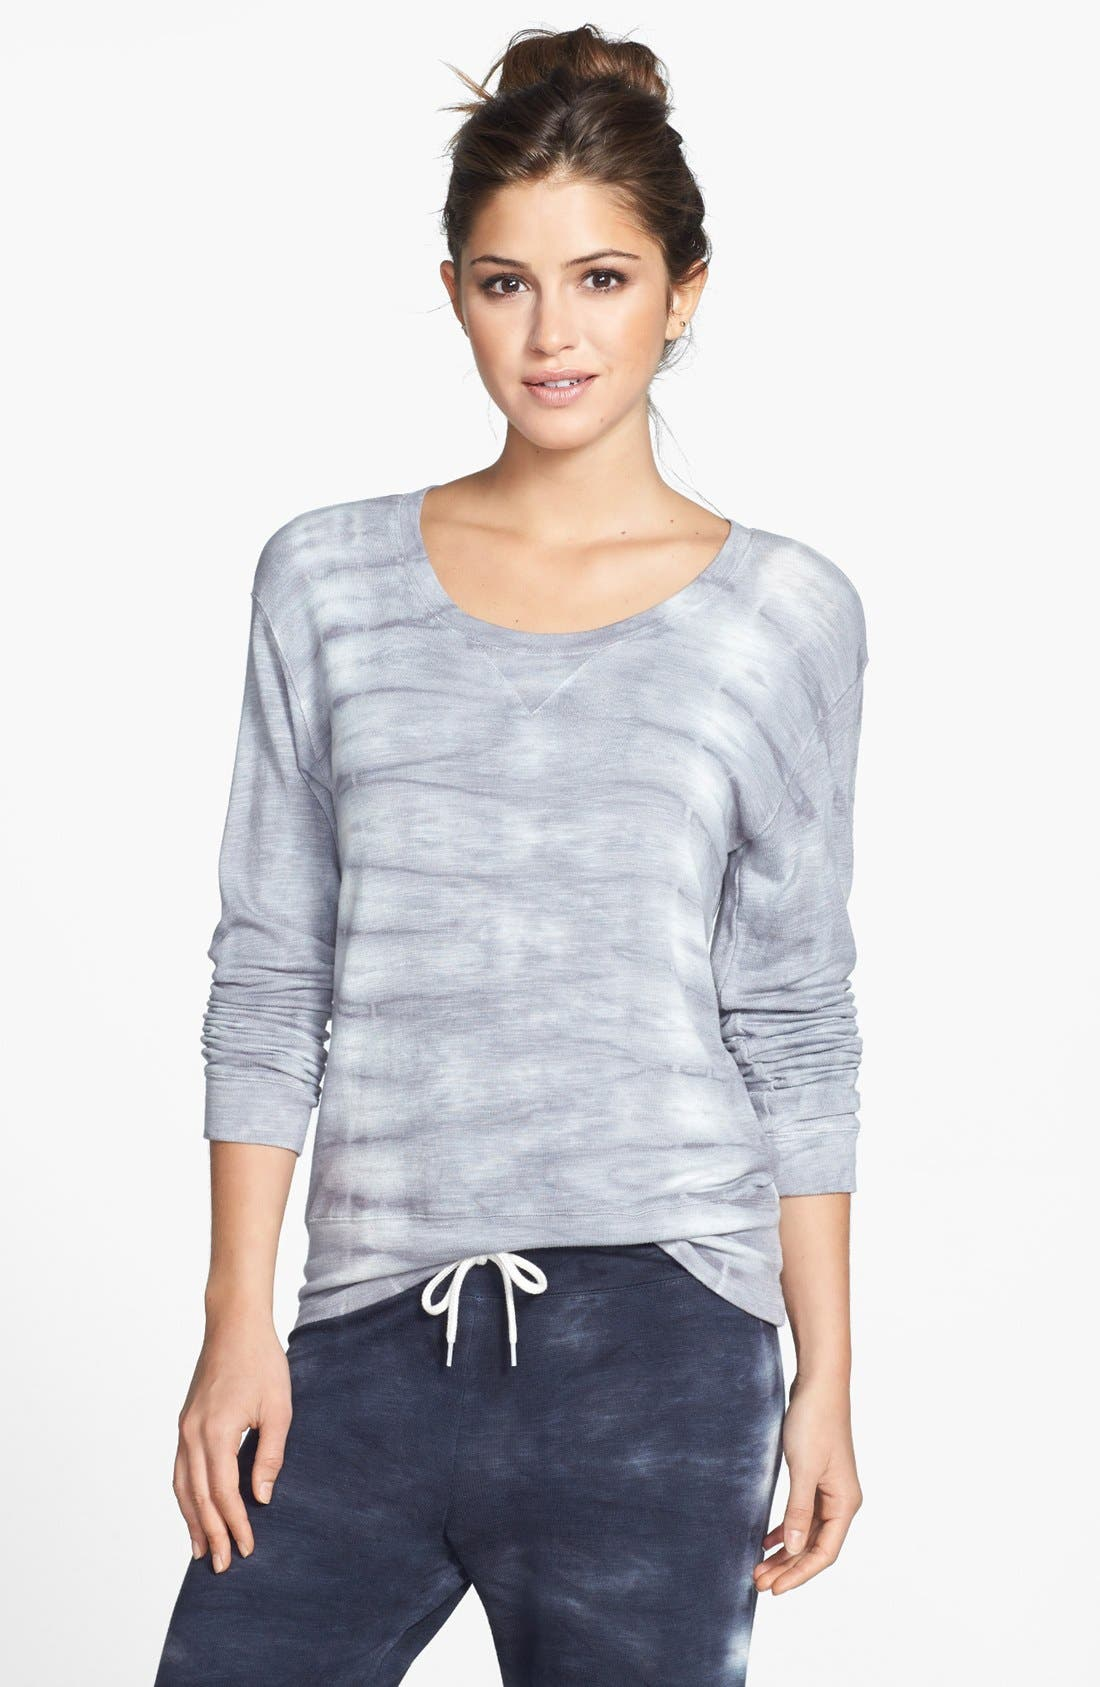 Main Image - Monrow 'Fish Bone' Crewneck Sweatshirt